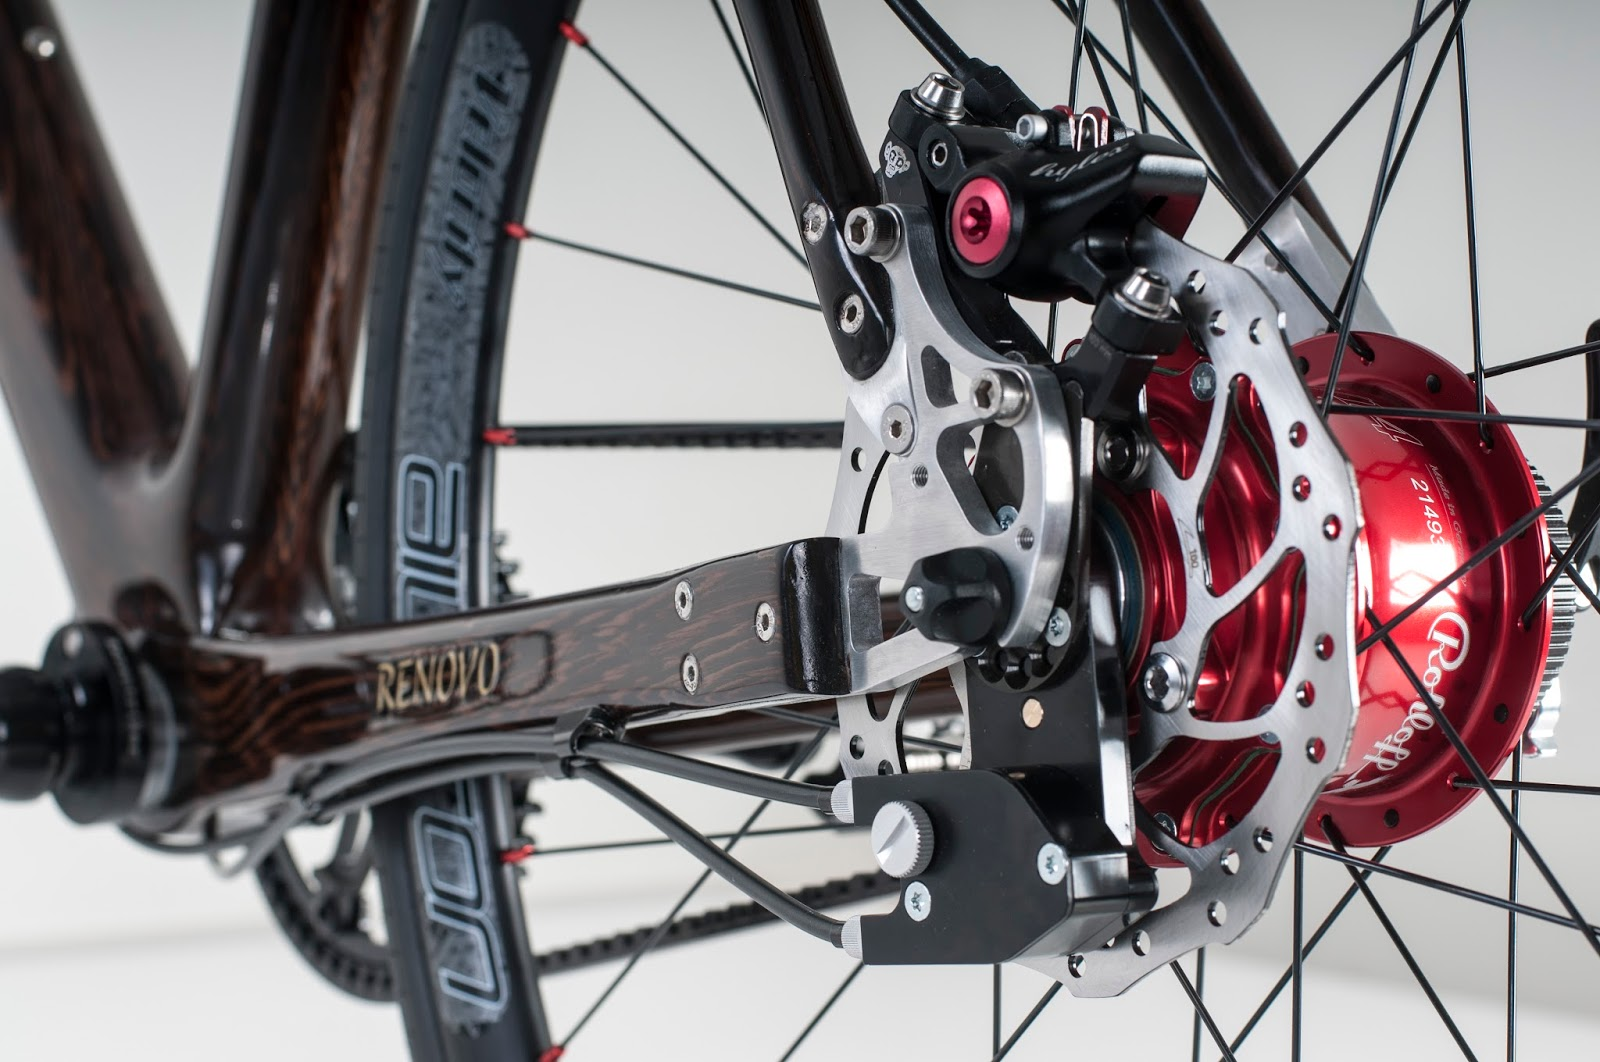 The Monkey Lab Renovo Wood Commuting Light Touring Bike